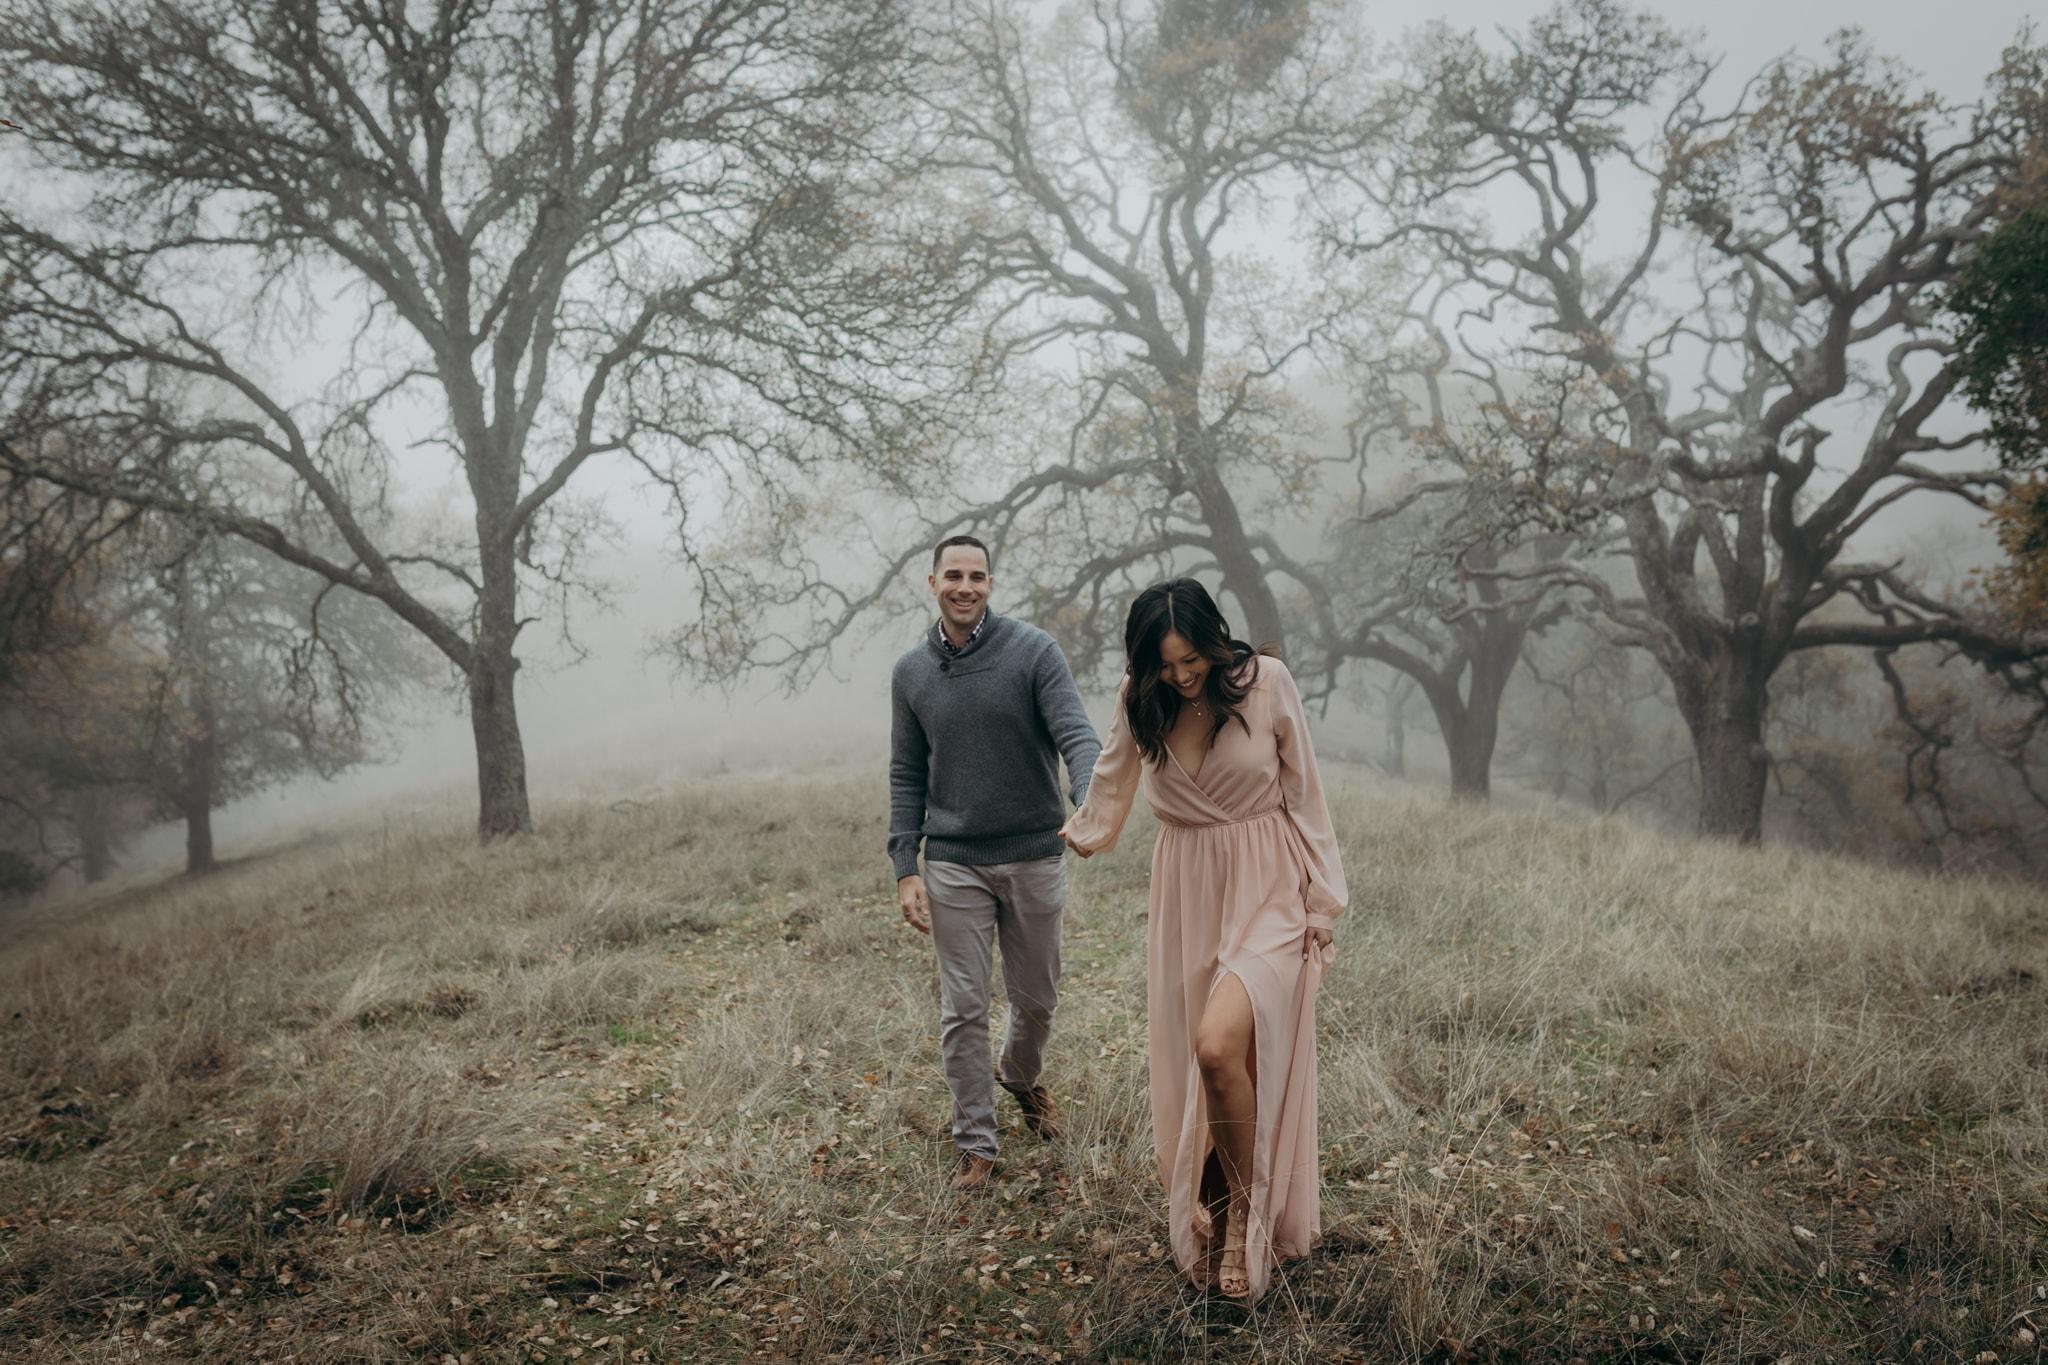 Walnut Creek Engagement Session Couple walking through fog